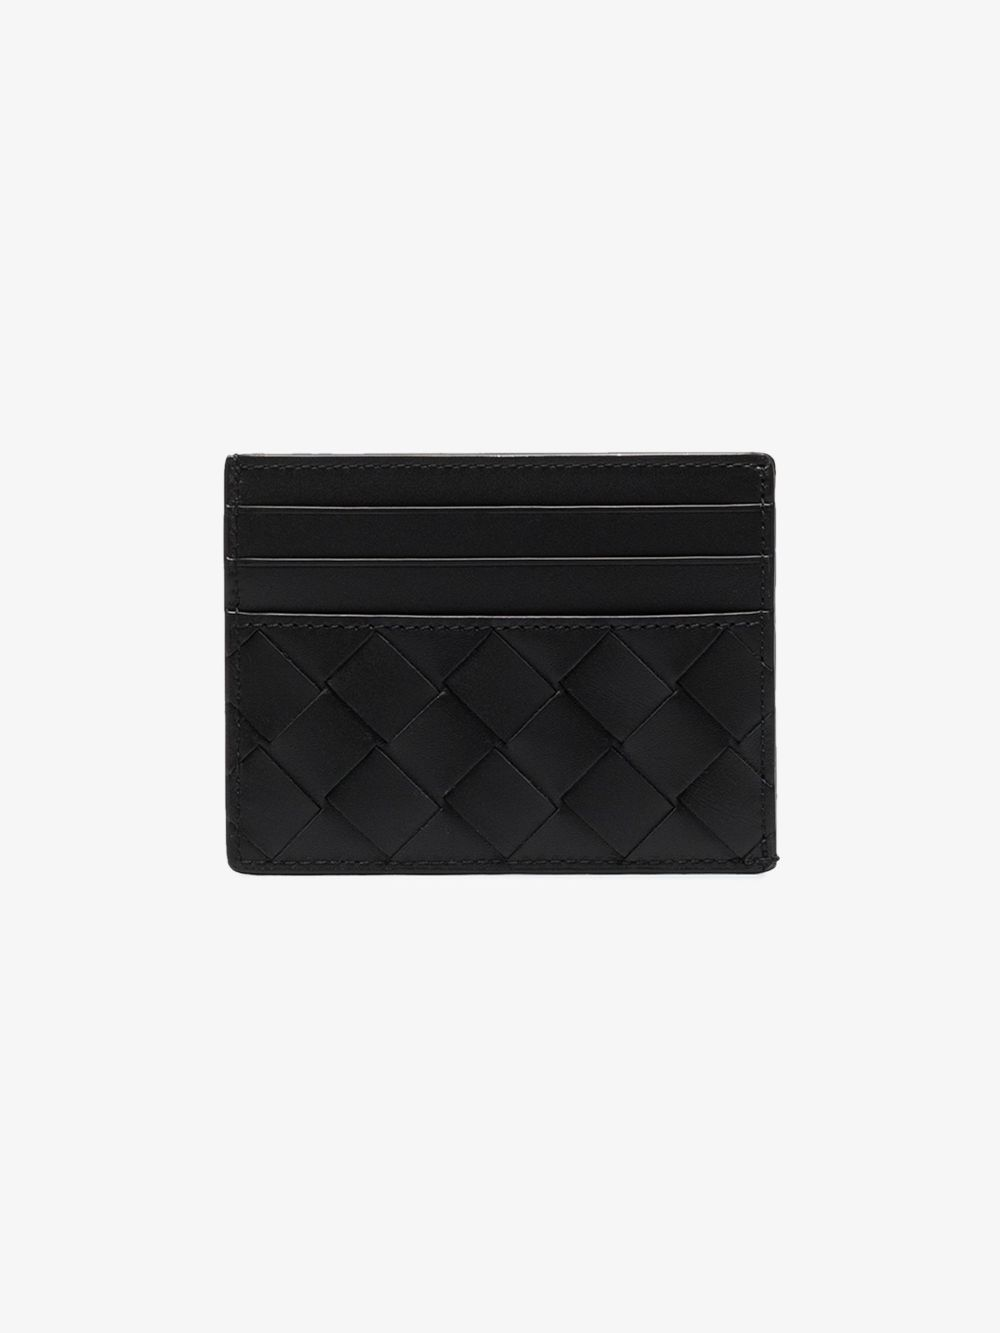 Picture of Bottega Veneta | Intrecciato Leather Cardholder